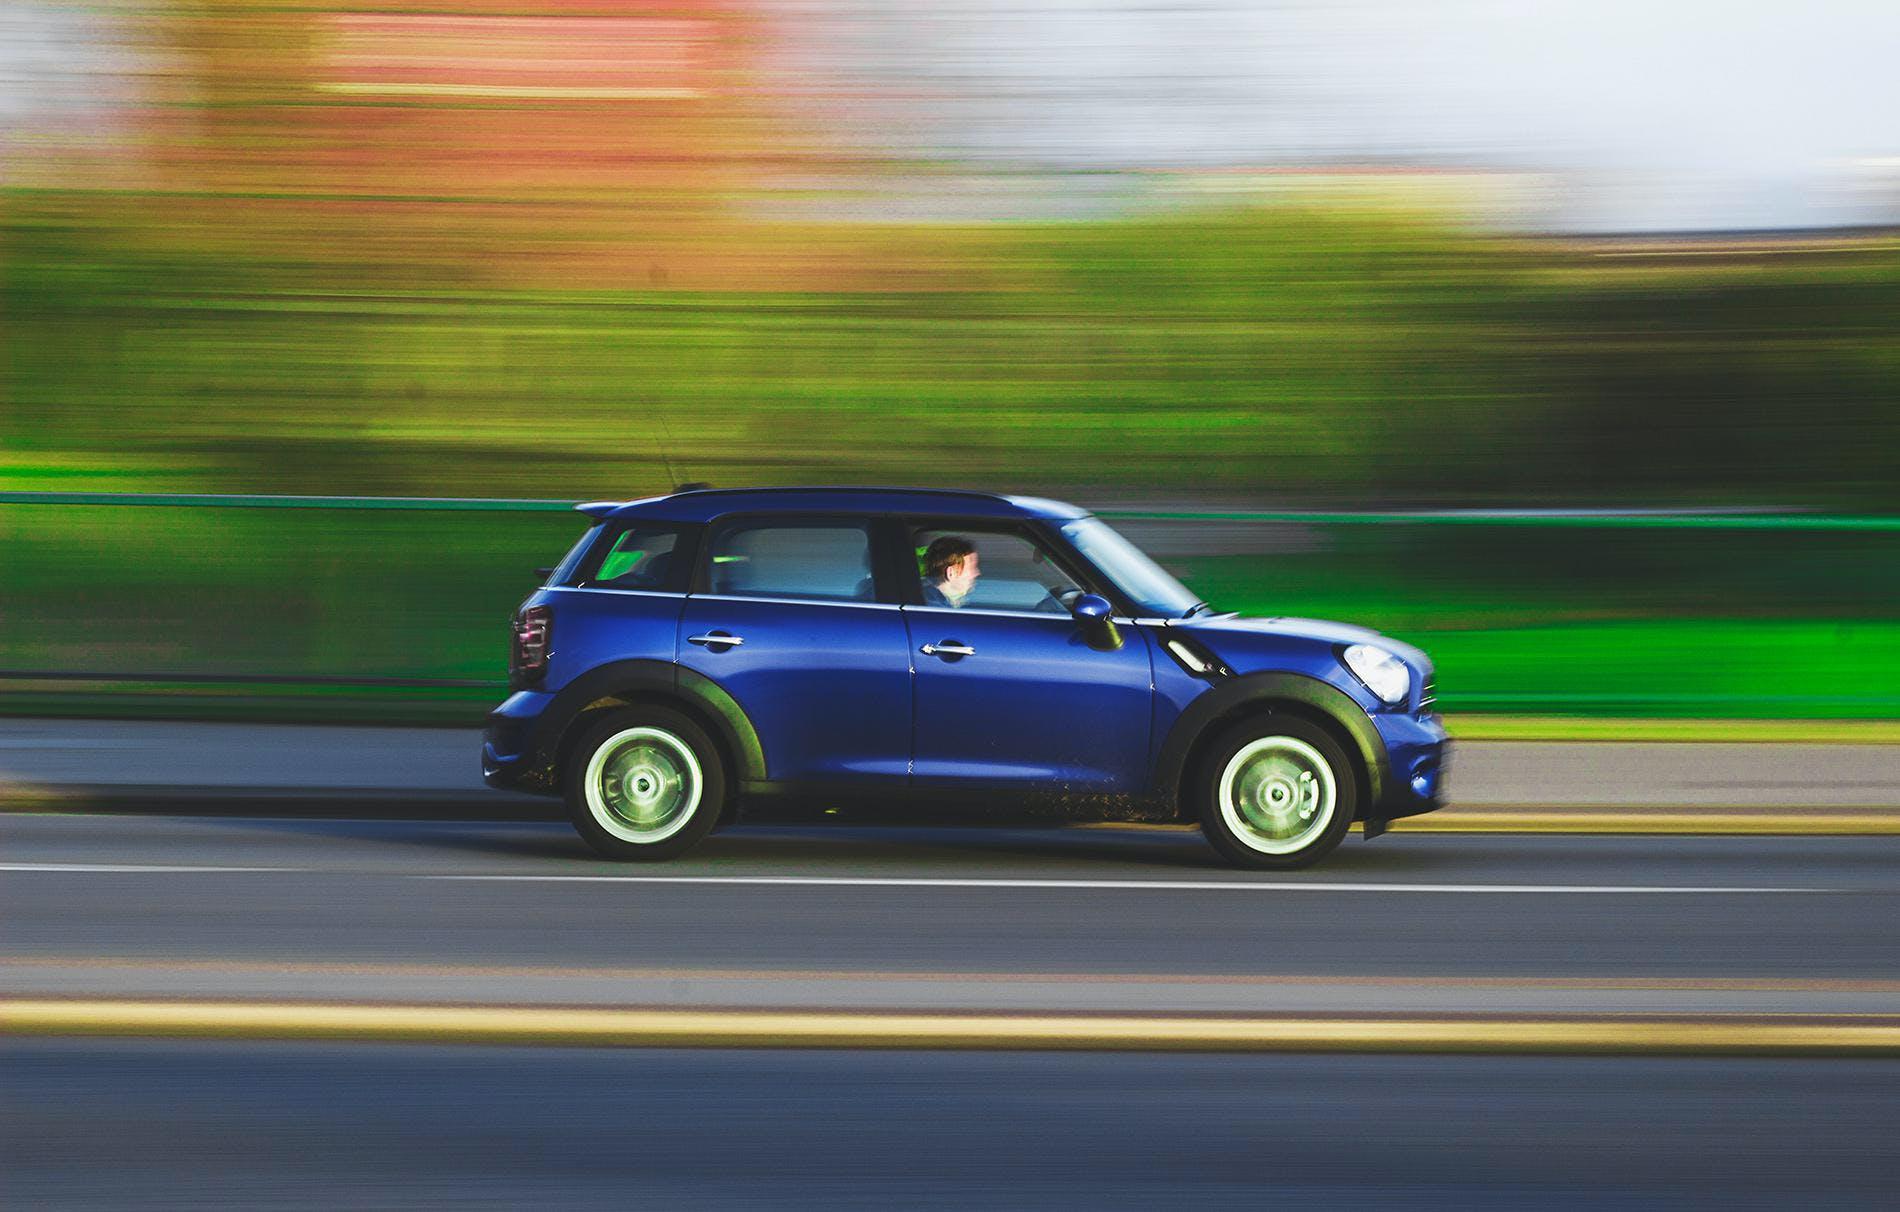 Kostenloses Stock Foto zu auto, autobahn, bewegung, fahren